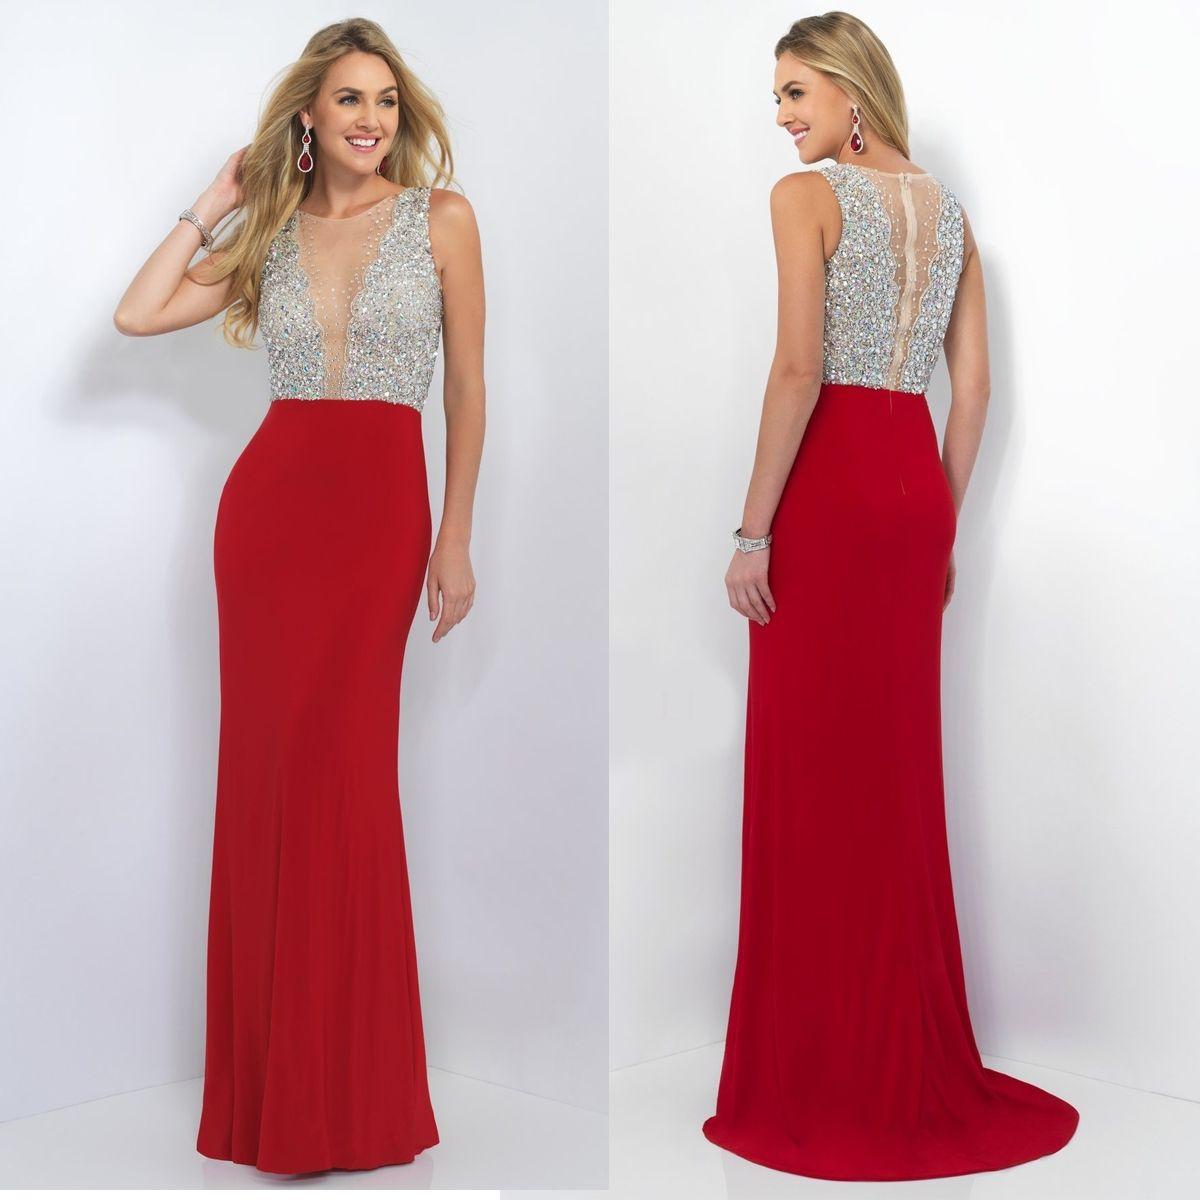 Sheer Beaded Illusion Top Long Prom Dress | Prom 2016 Top Picks ...